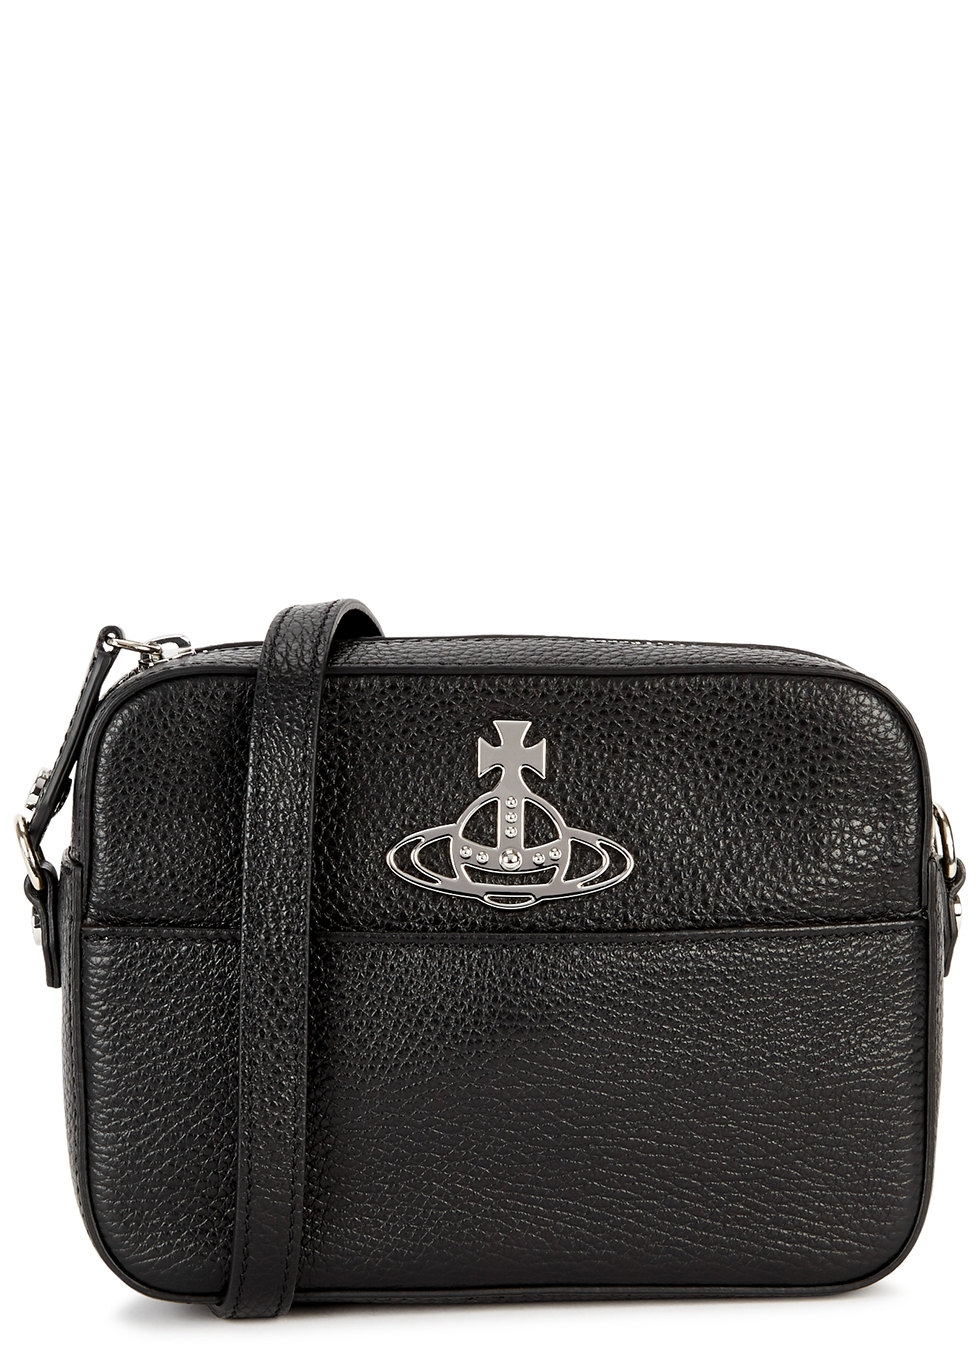 Johanna black leather cross-body bag